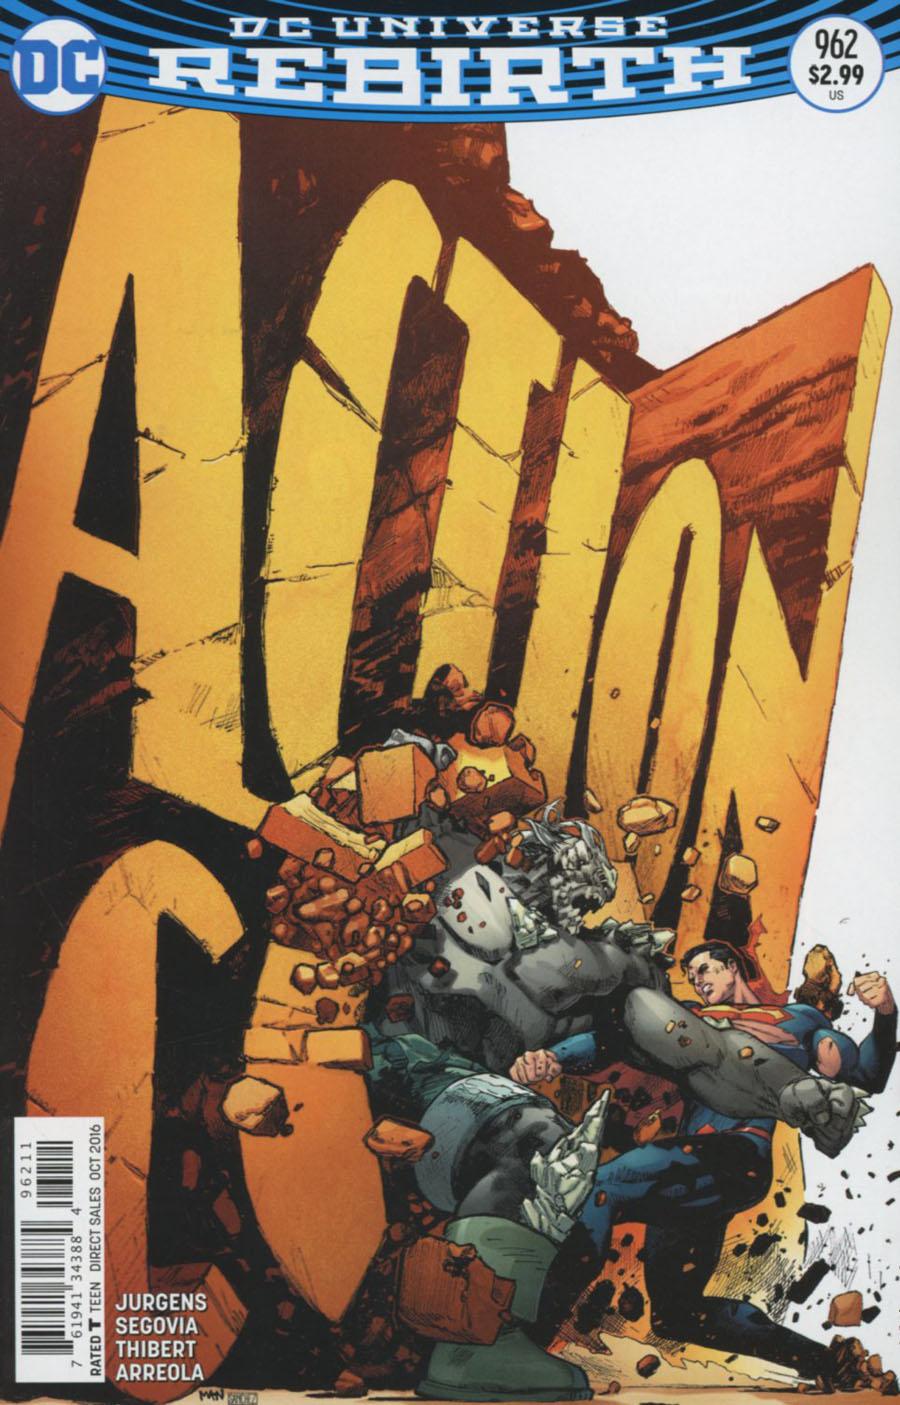 Action Comics Vol 2 #962 Cover A Regular Clay Mann Cover